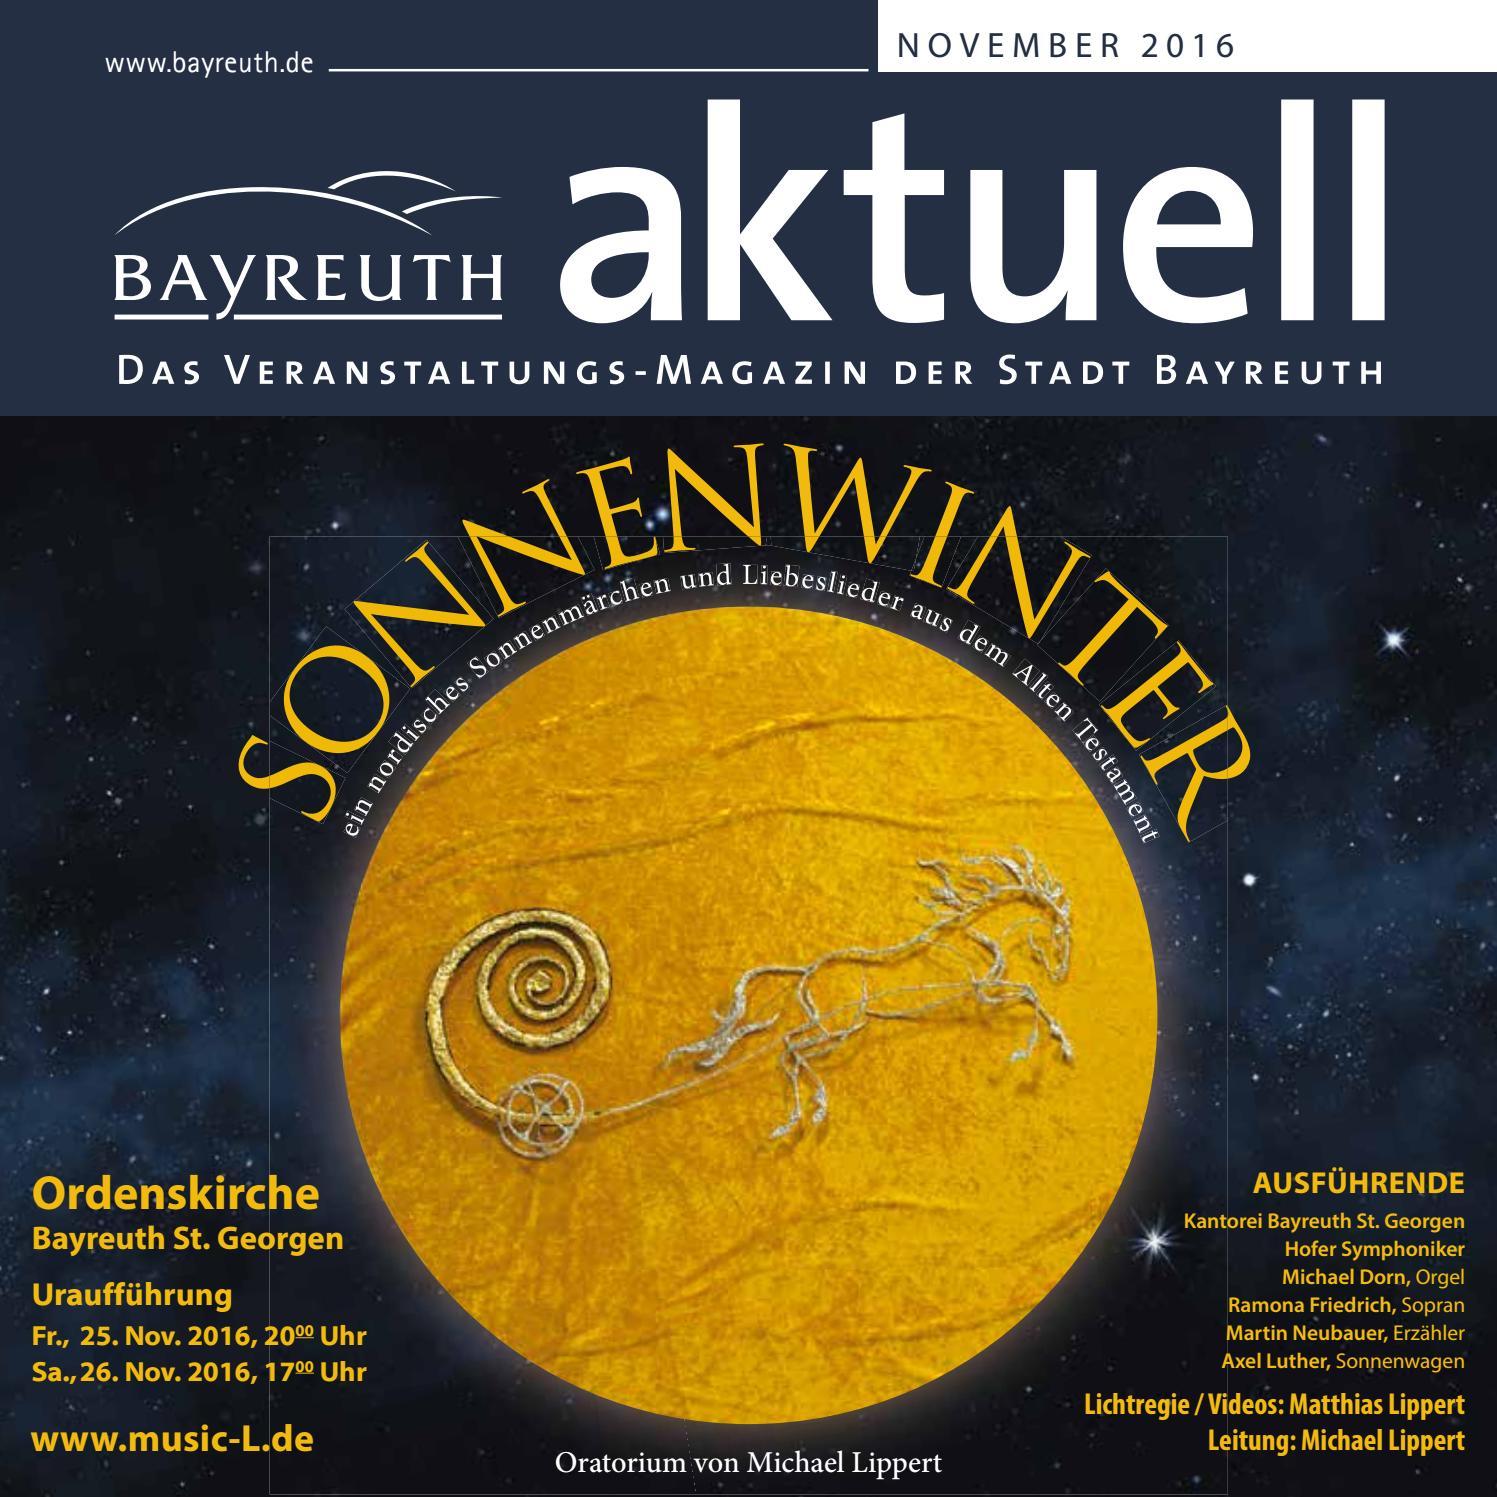 Bayreuth Aktuell November 2016 by Bayreuther Sonntagszeitung - issuu